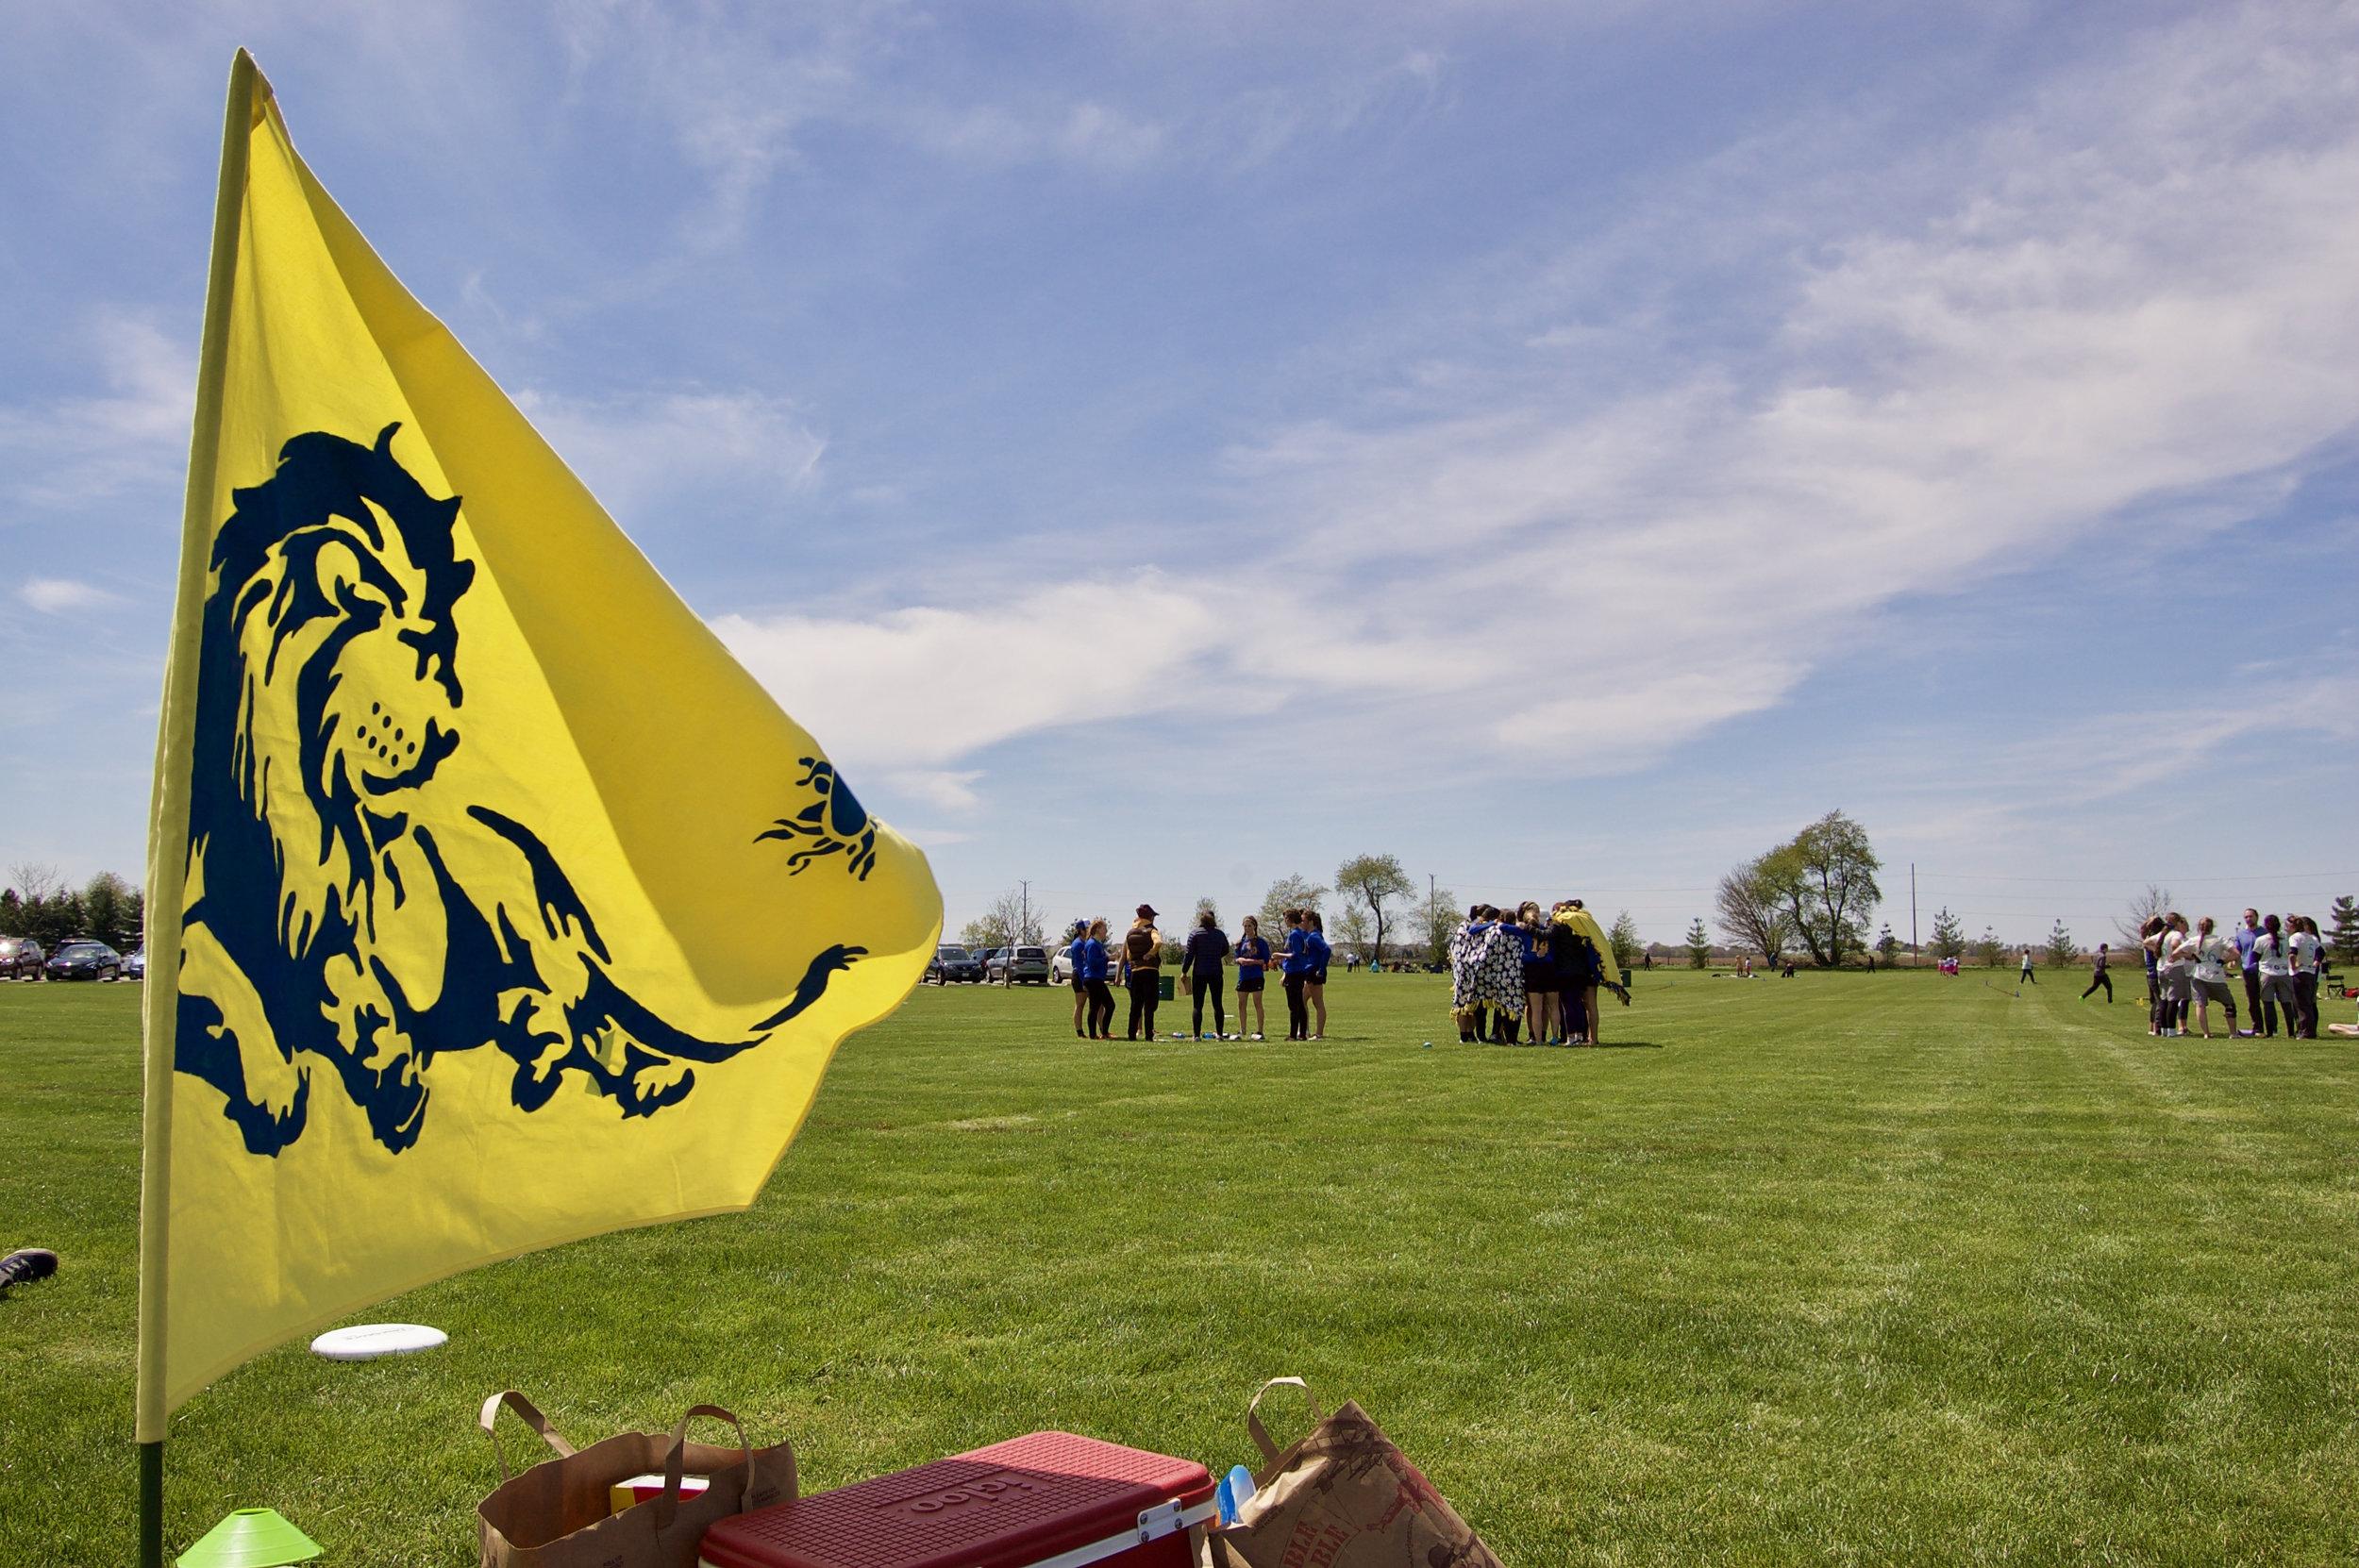 Nemea. Stuarts Sports Complex. Montgomery, Illinois. April 2017. © William D. Walker